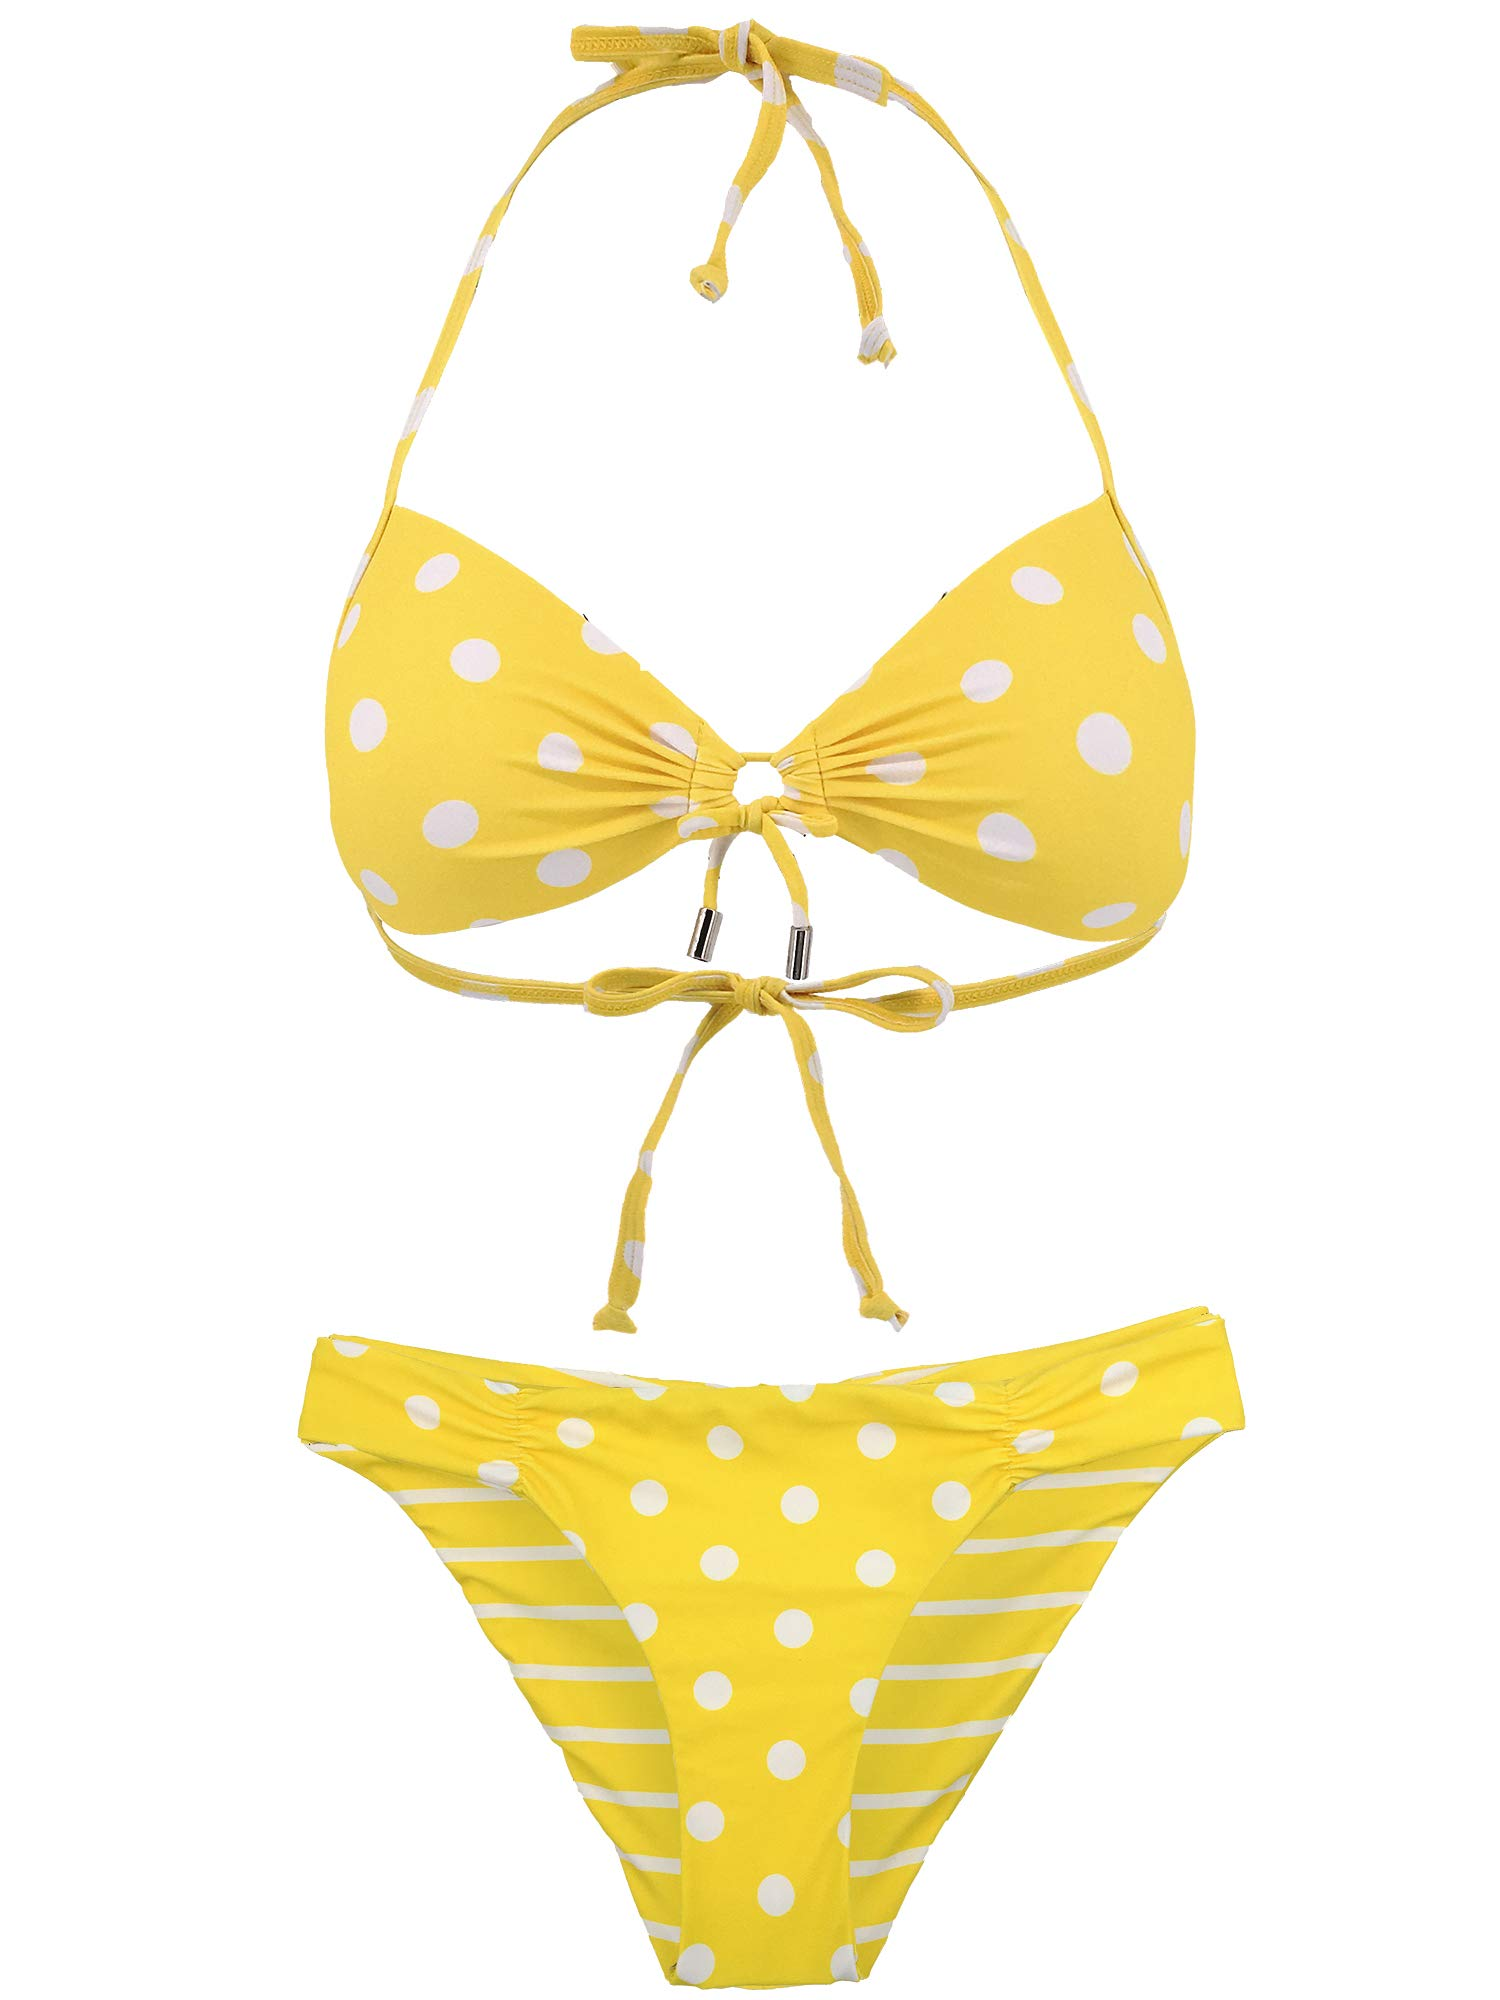 Women's Halter Bikini Set Swimsuit Bathing Suit with Polka Dots Print